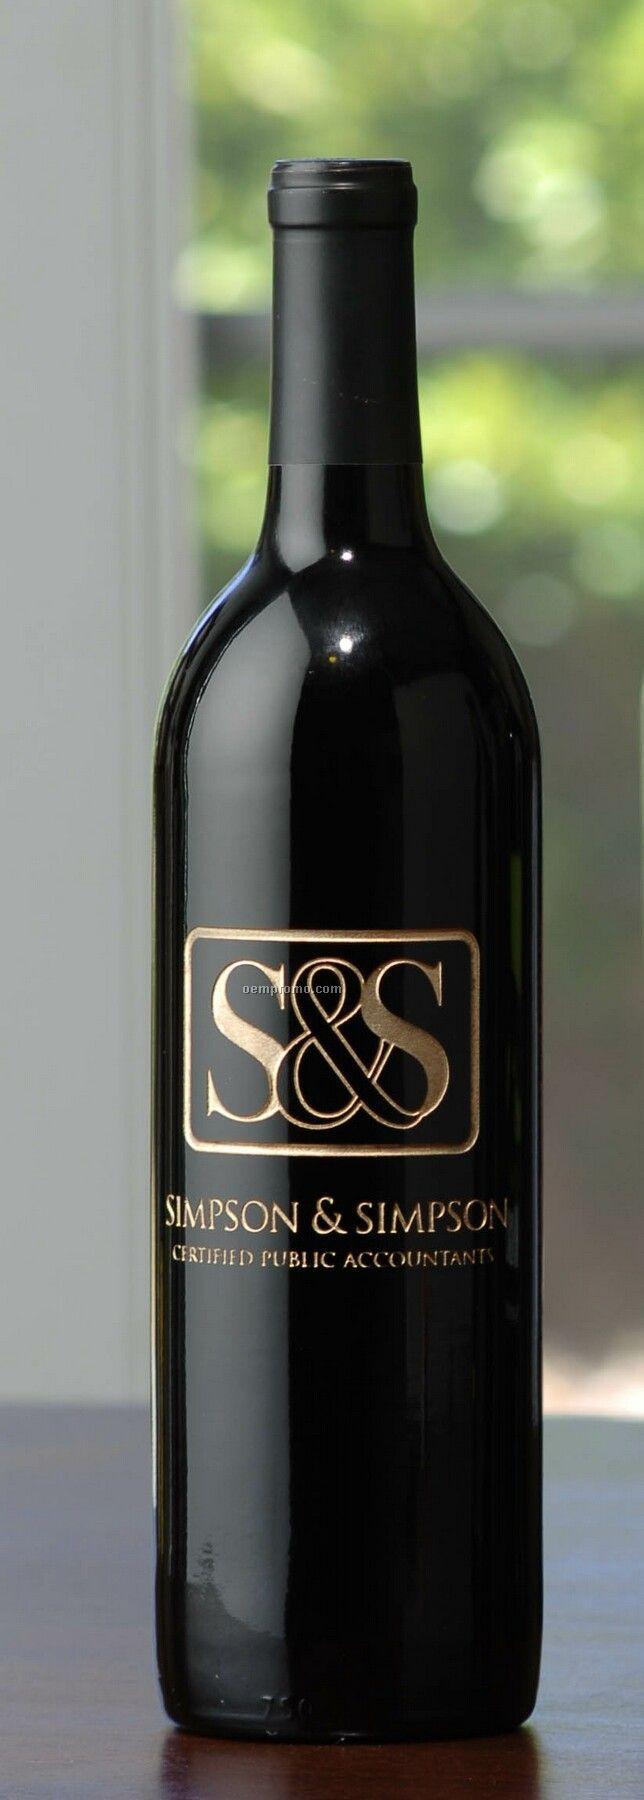 2005 Stonefly Vineyards Cabernet Sauvignon, Carnivale Vineyard (Etched Wine